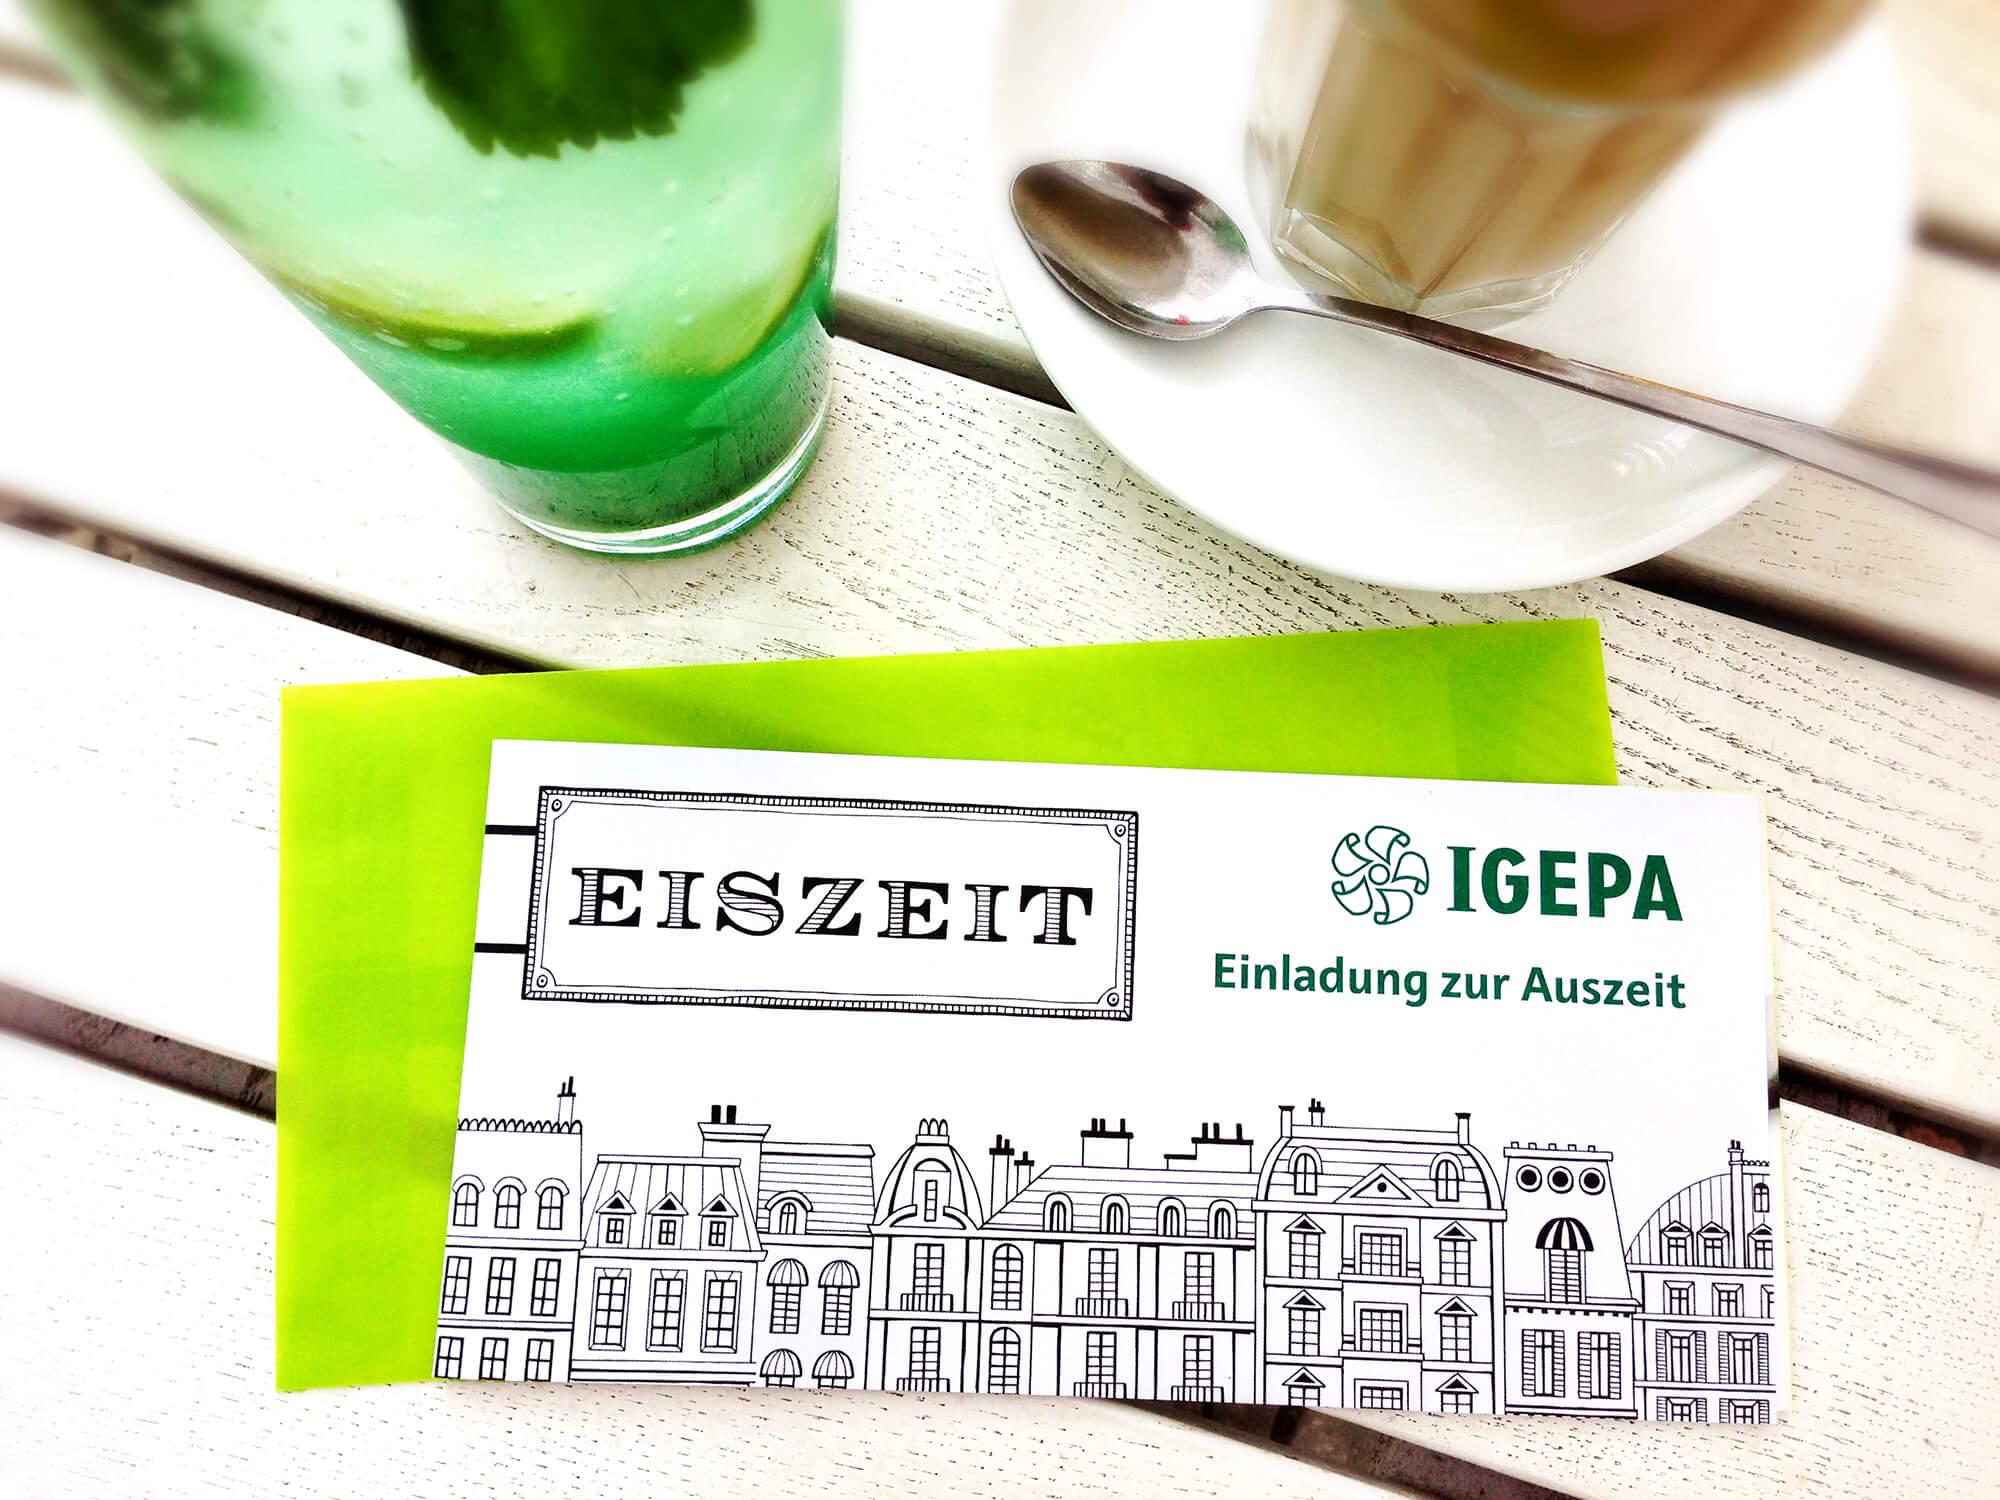 IGEPA_09_Webt